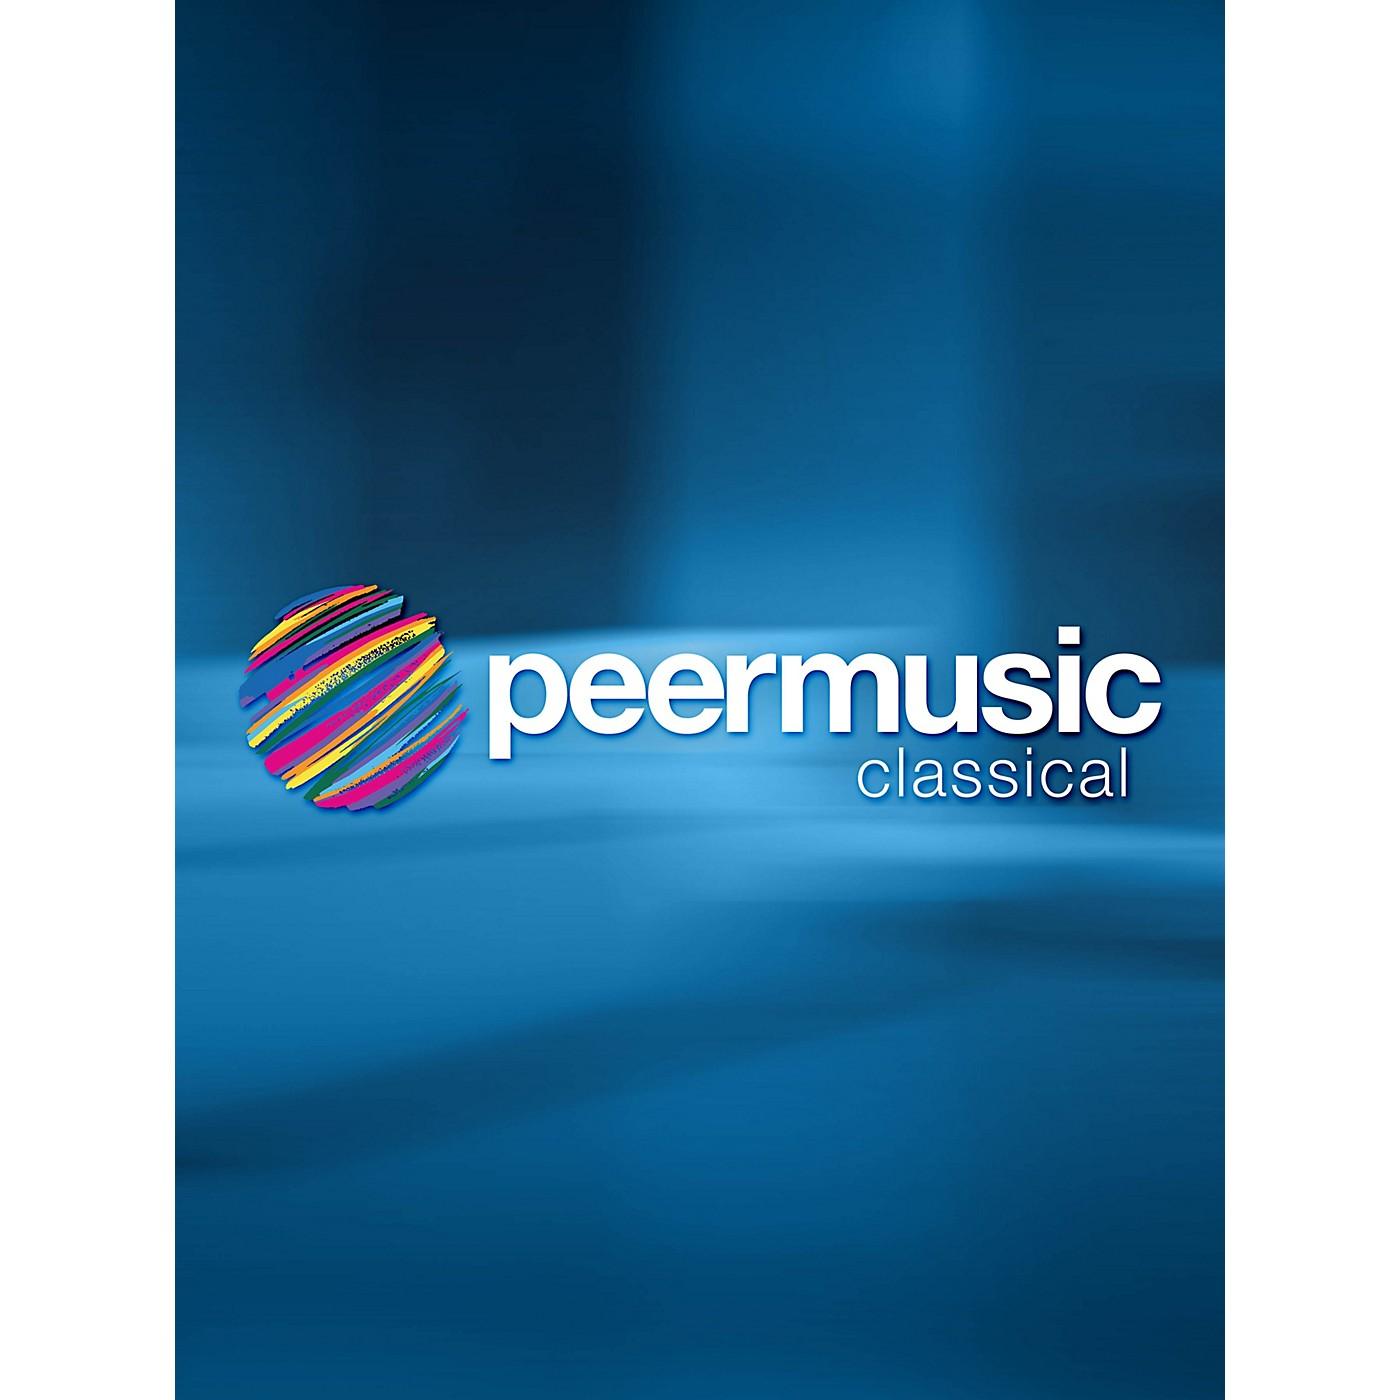 Peer Music Sonatina Ritmica (Piano Solo) Peermusic Classical Series Softcover thumbnail